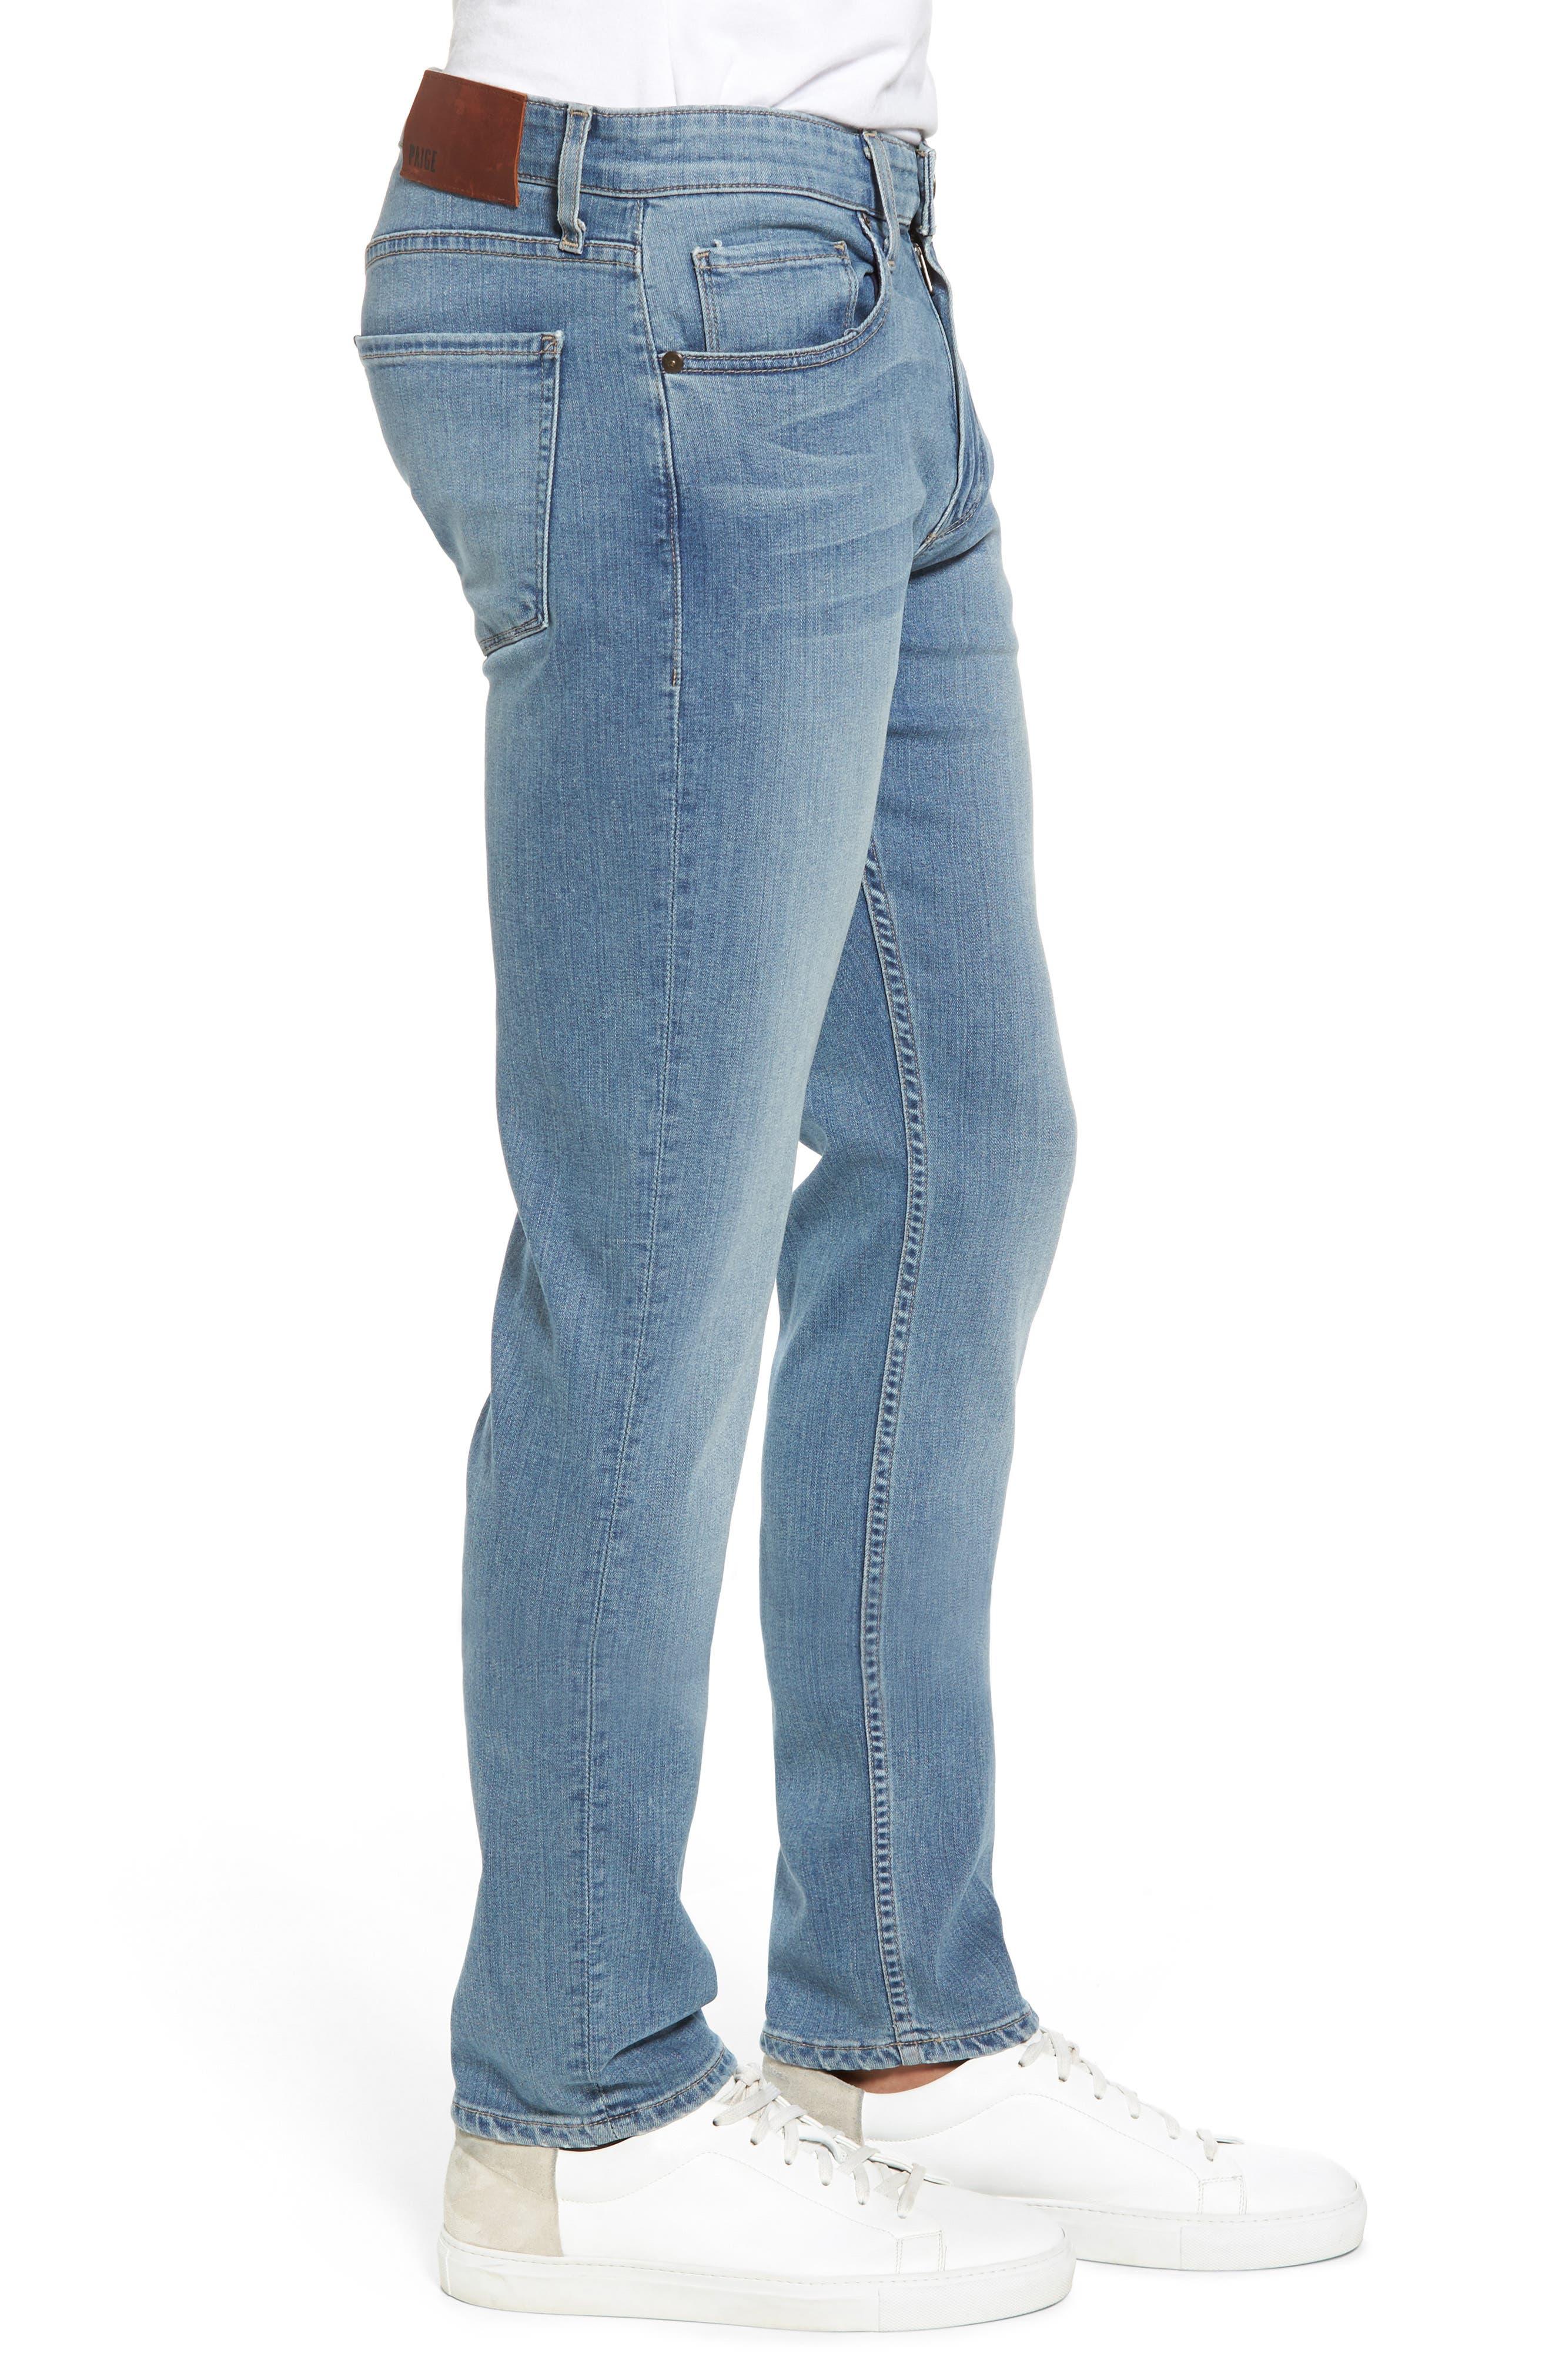 Transcend - Lennox Slim Fit Jeans,                             Alternate thumbnail 3, color,